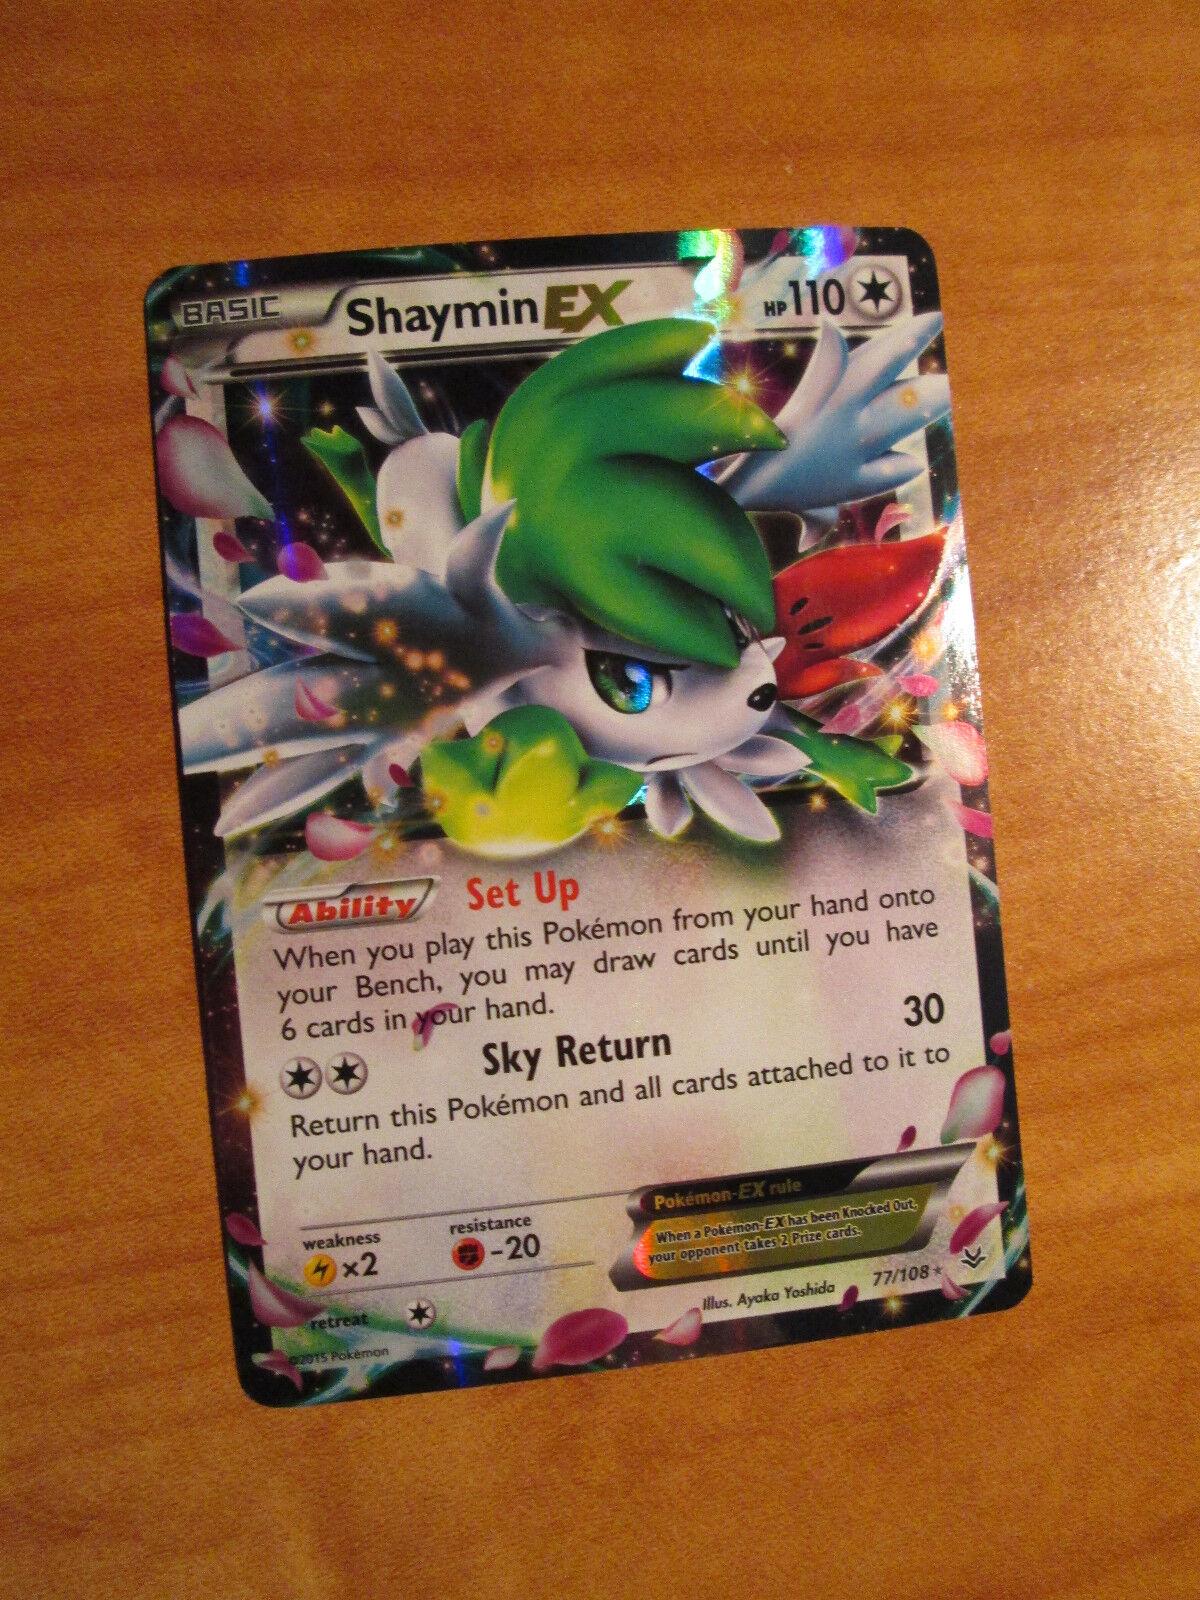 Lp Pokemon Shaymin Ex Card Roaring Skies Set 77108 Xy X And Y Ultra